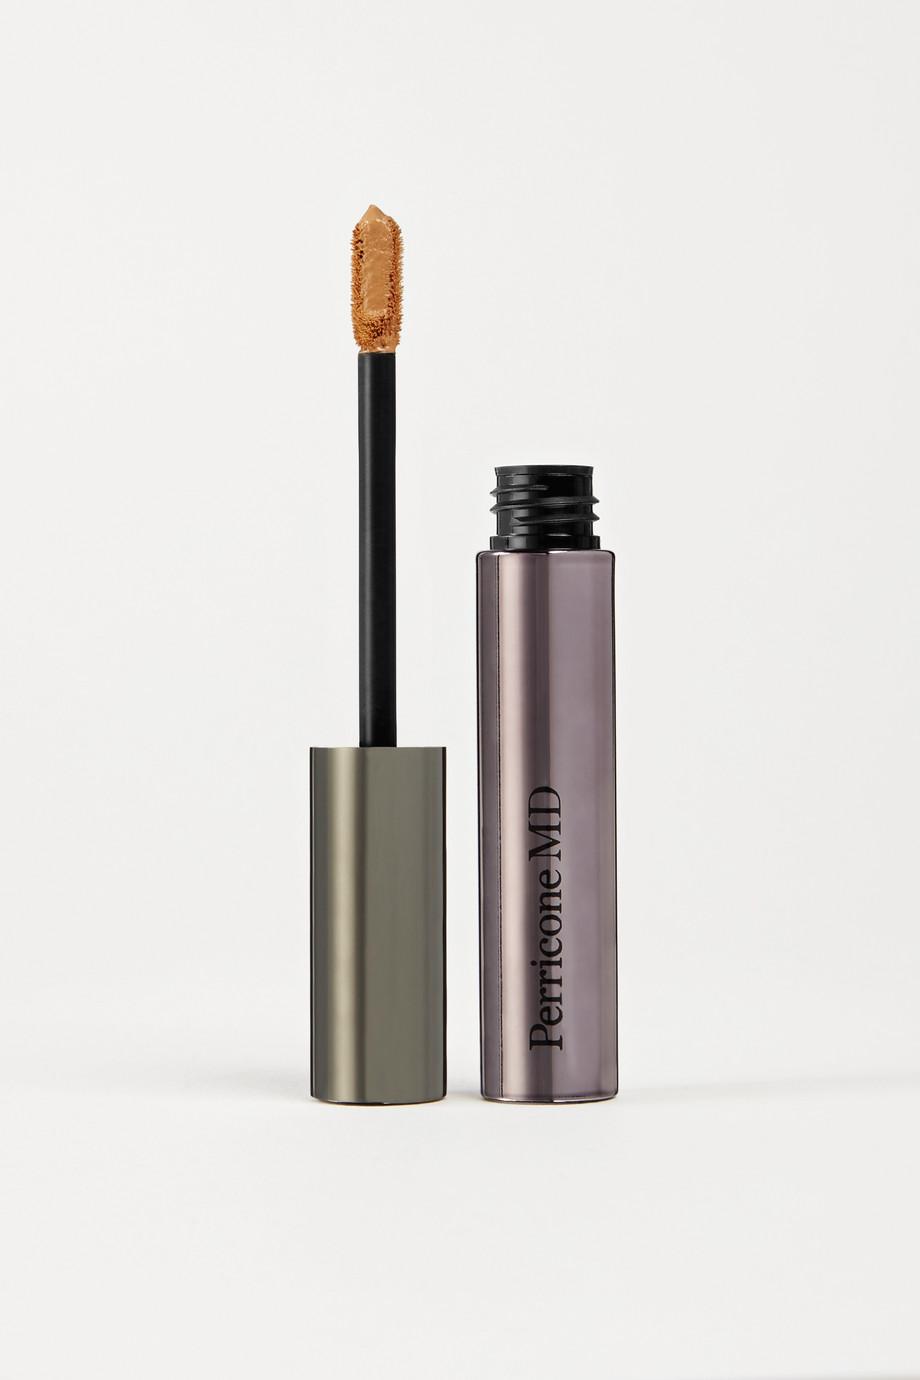 Perricone MD No Makeup Concealer Broad Spectrum SPF20 - Tan, 10ml